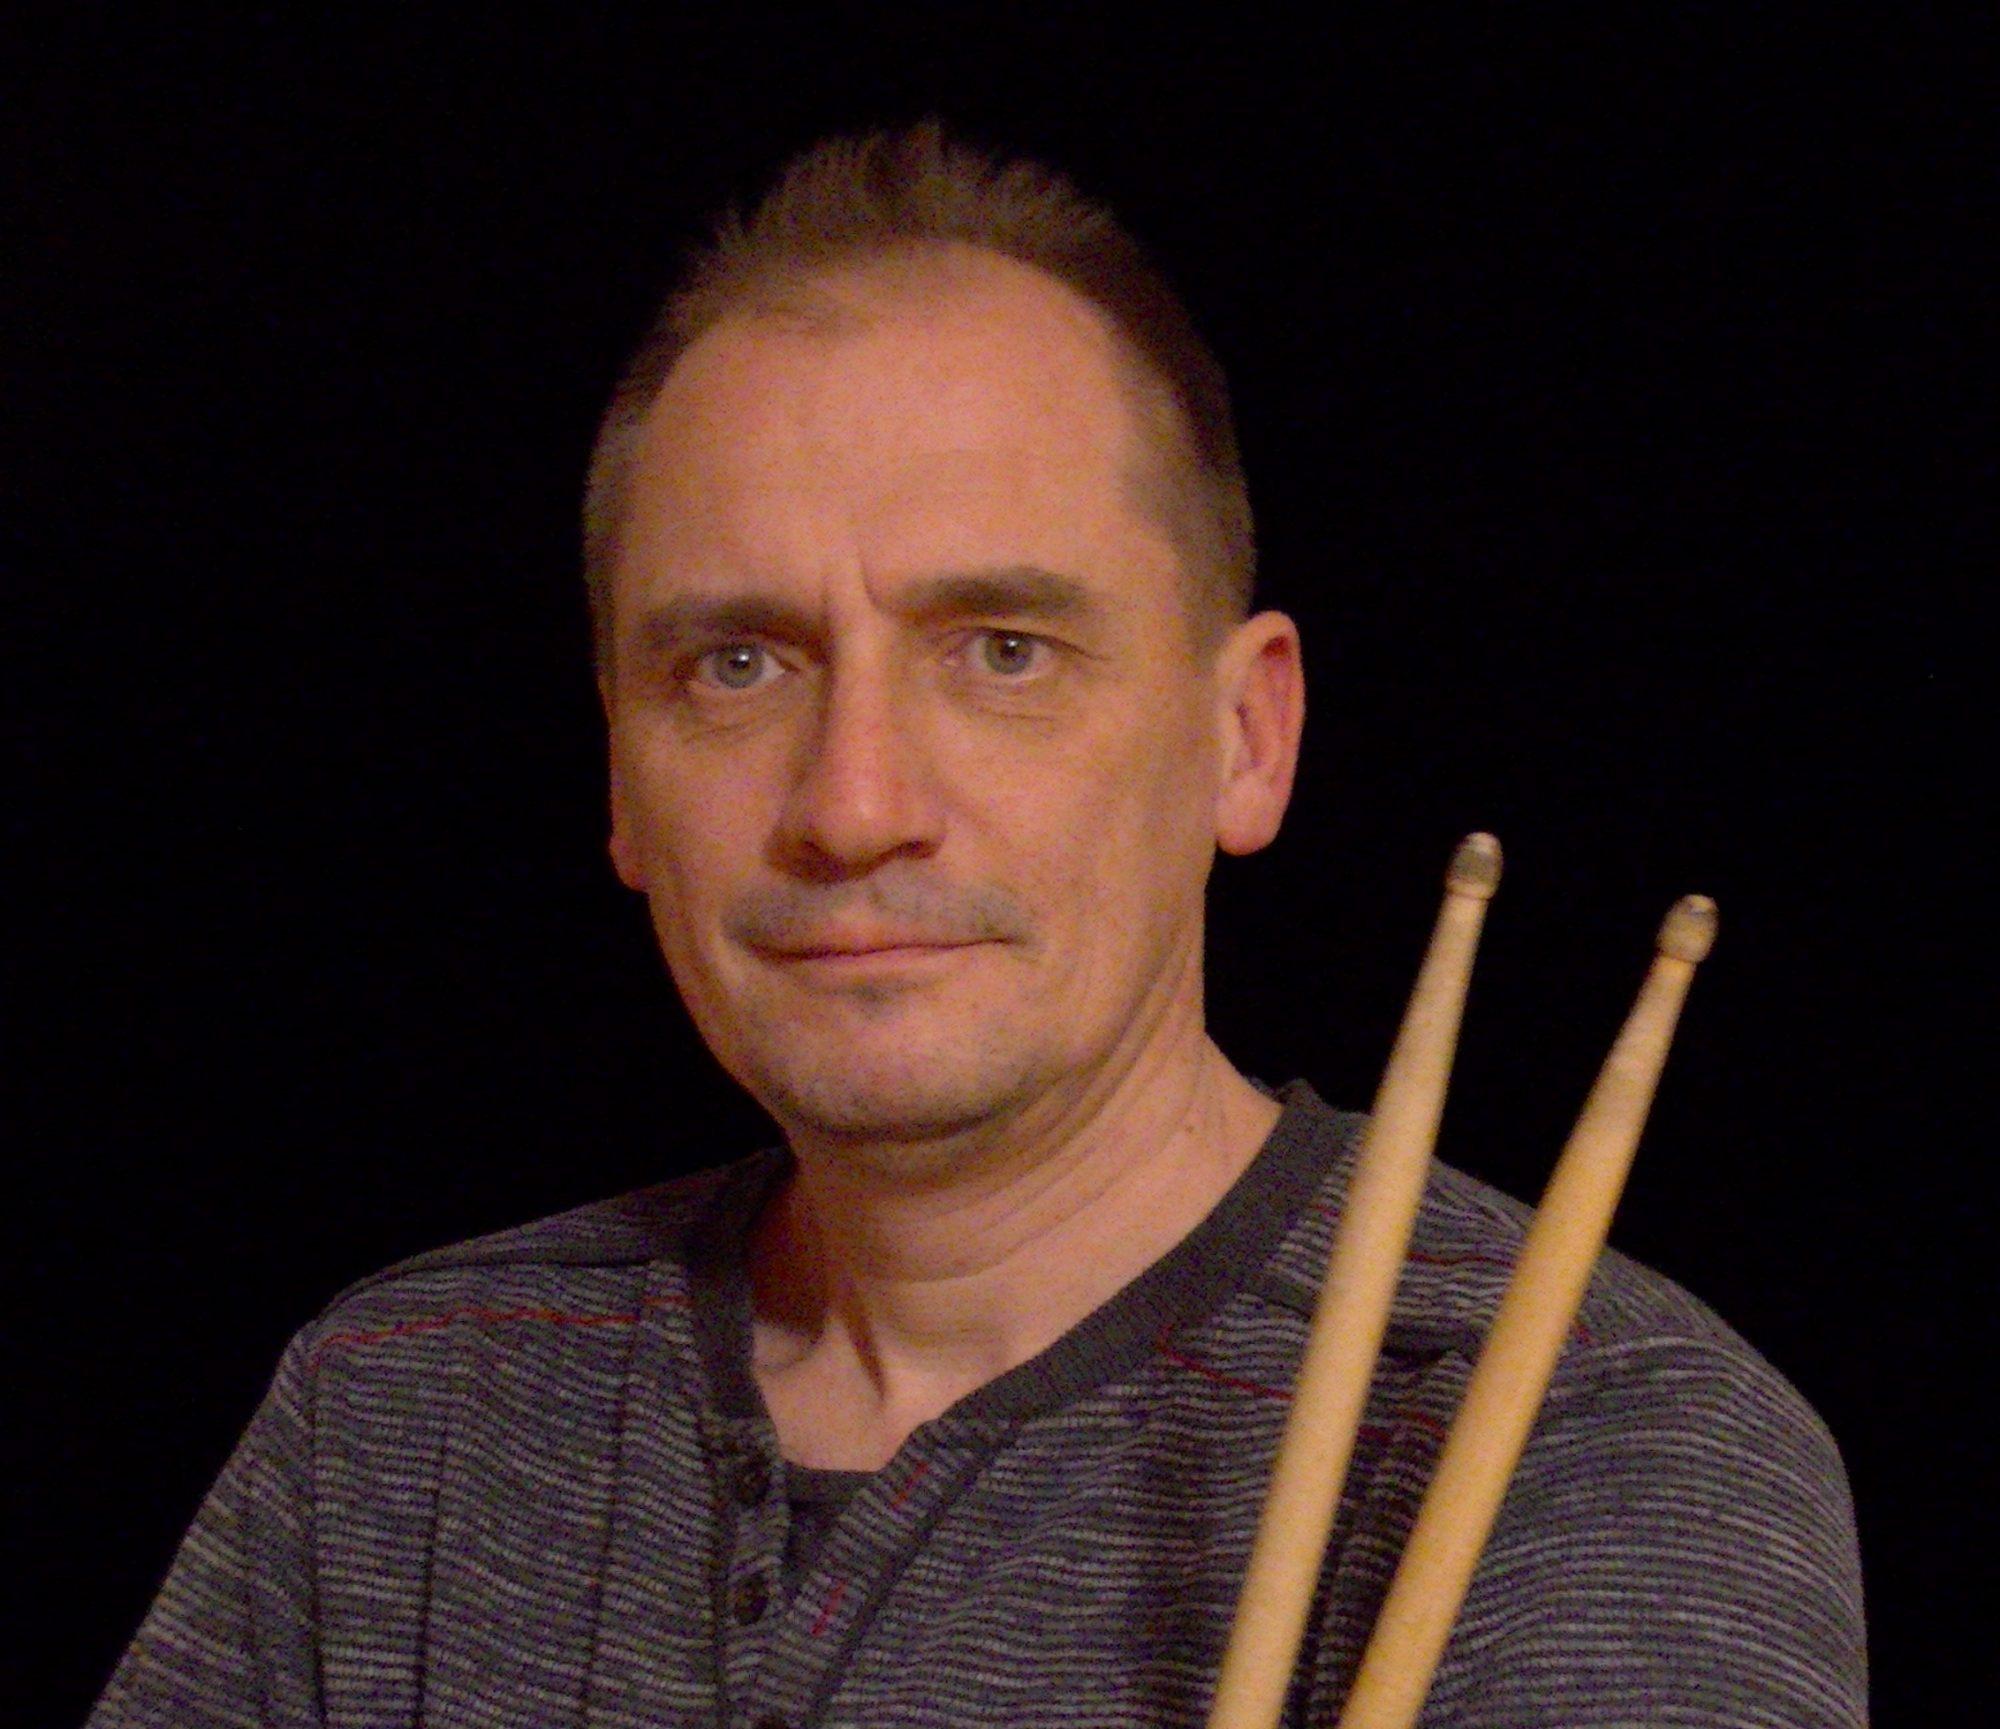 Akademia Młodego Perkusisty